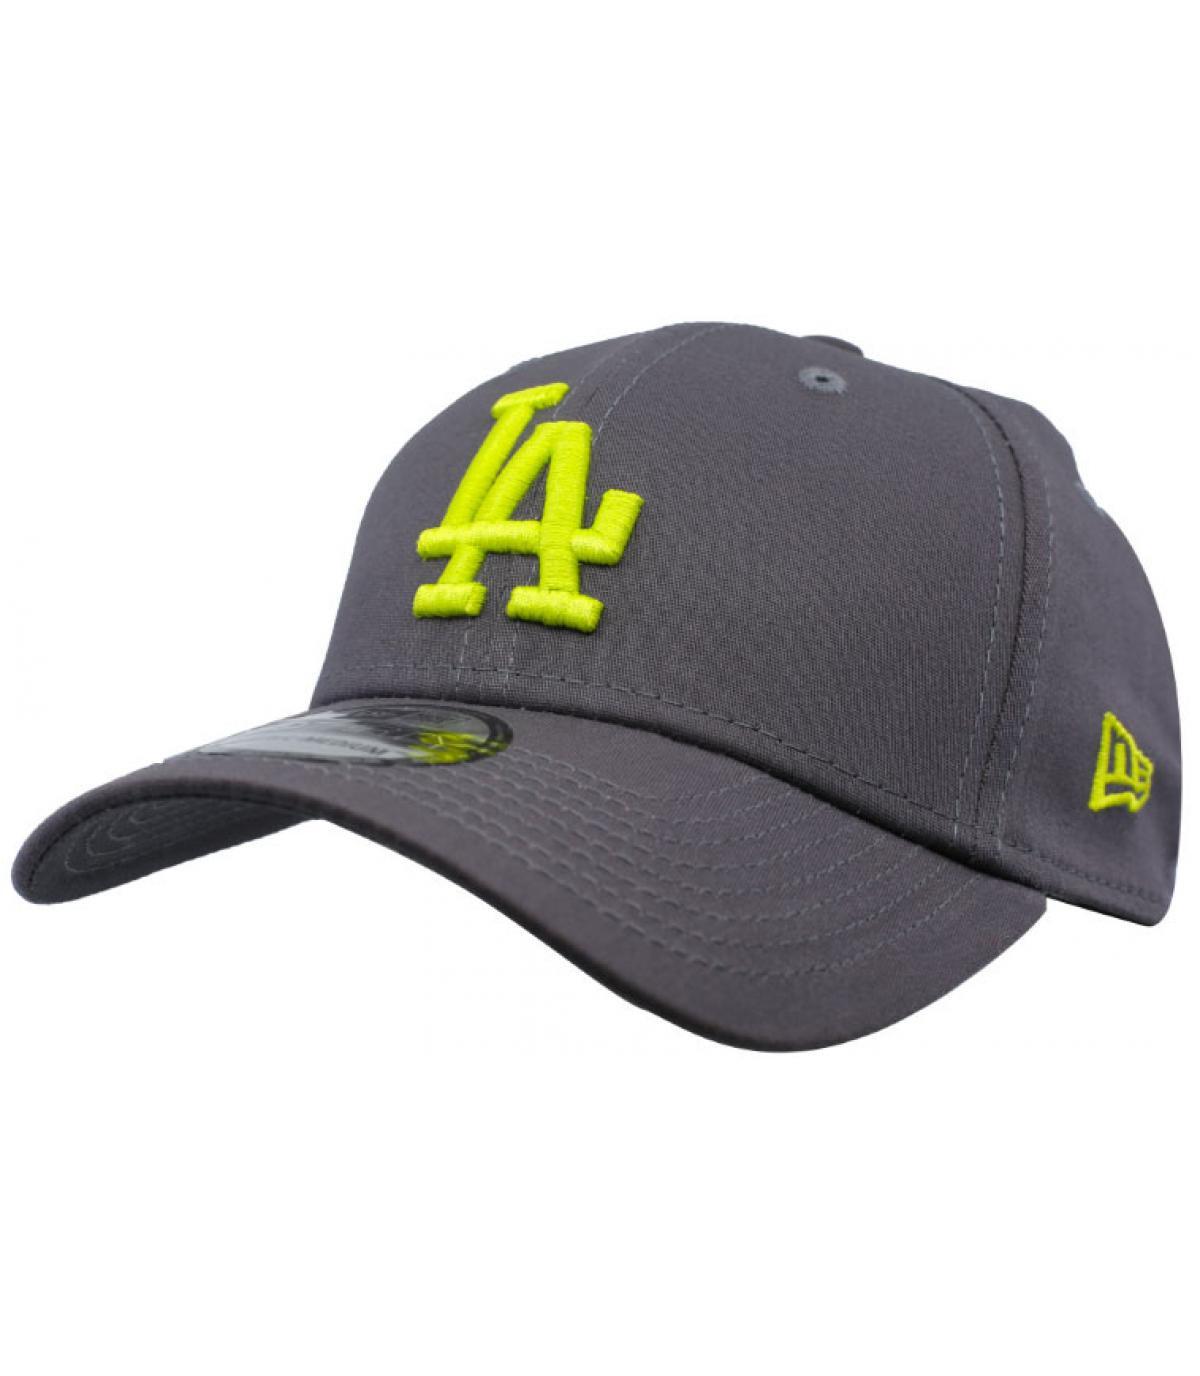 Details Cap League Ess LA 39Thirty graphite cyber yellow - Abbildung 2